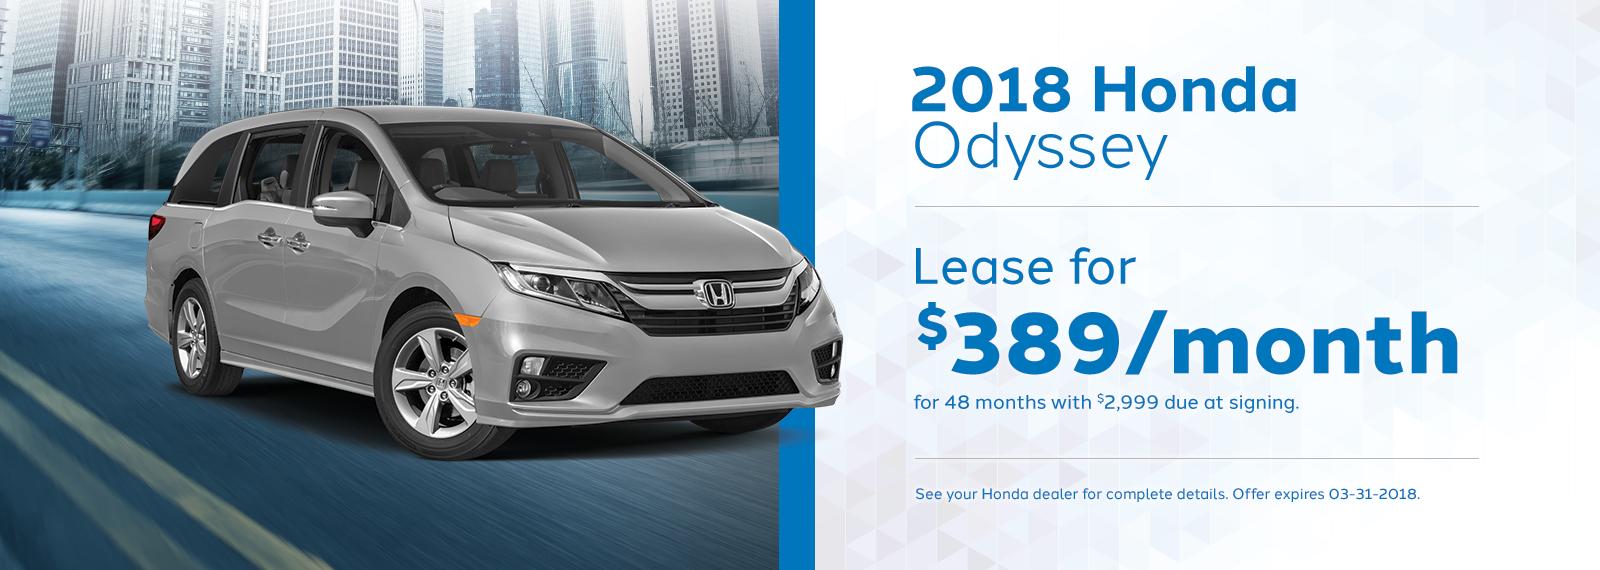 Odyssey March Offer Genthe Honda Homepage.